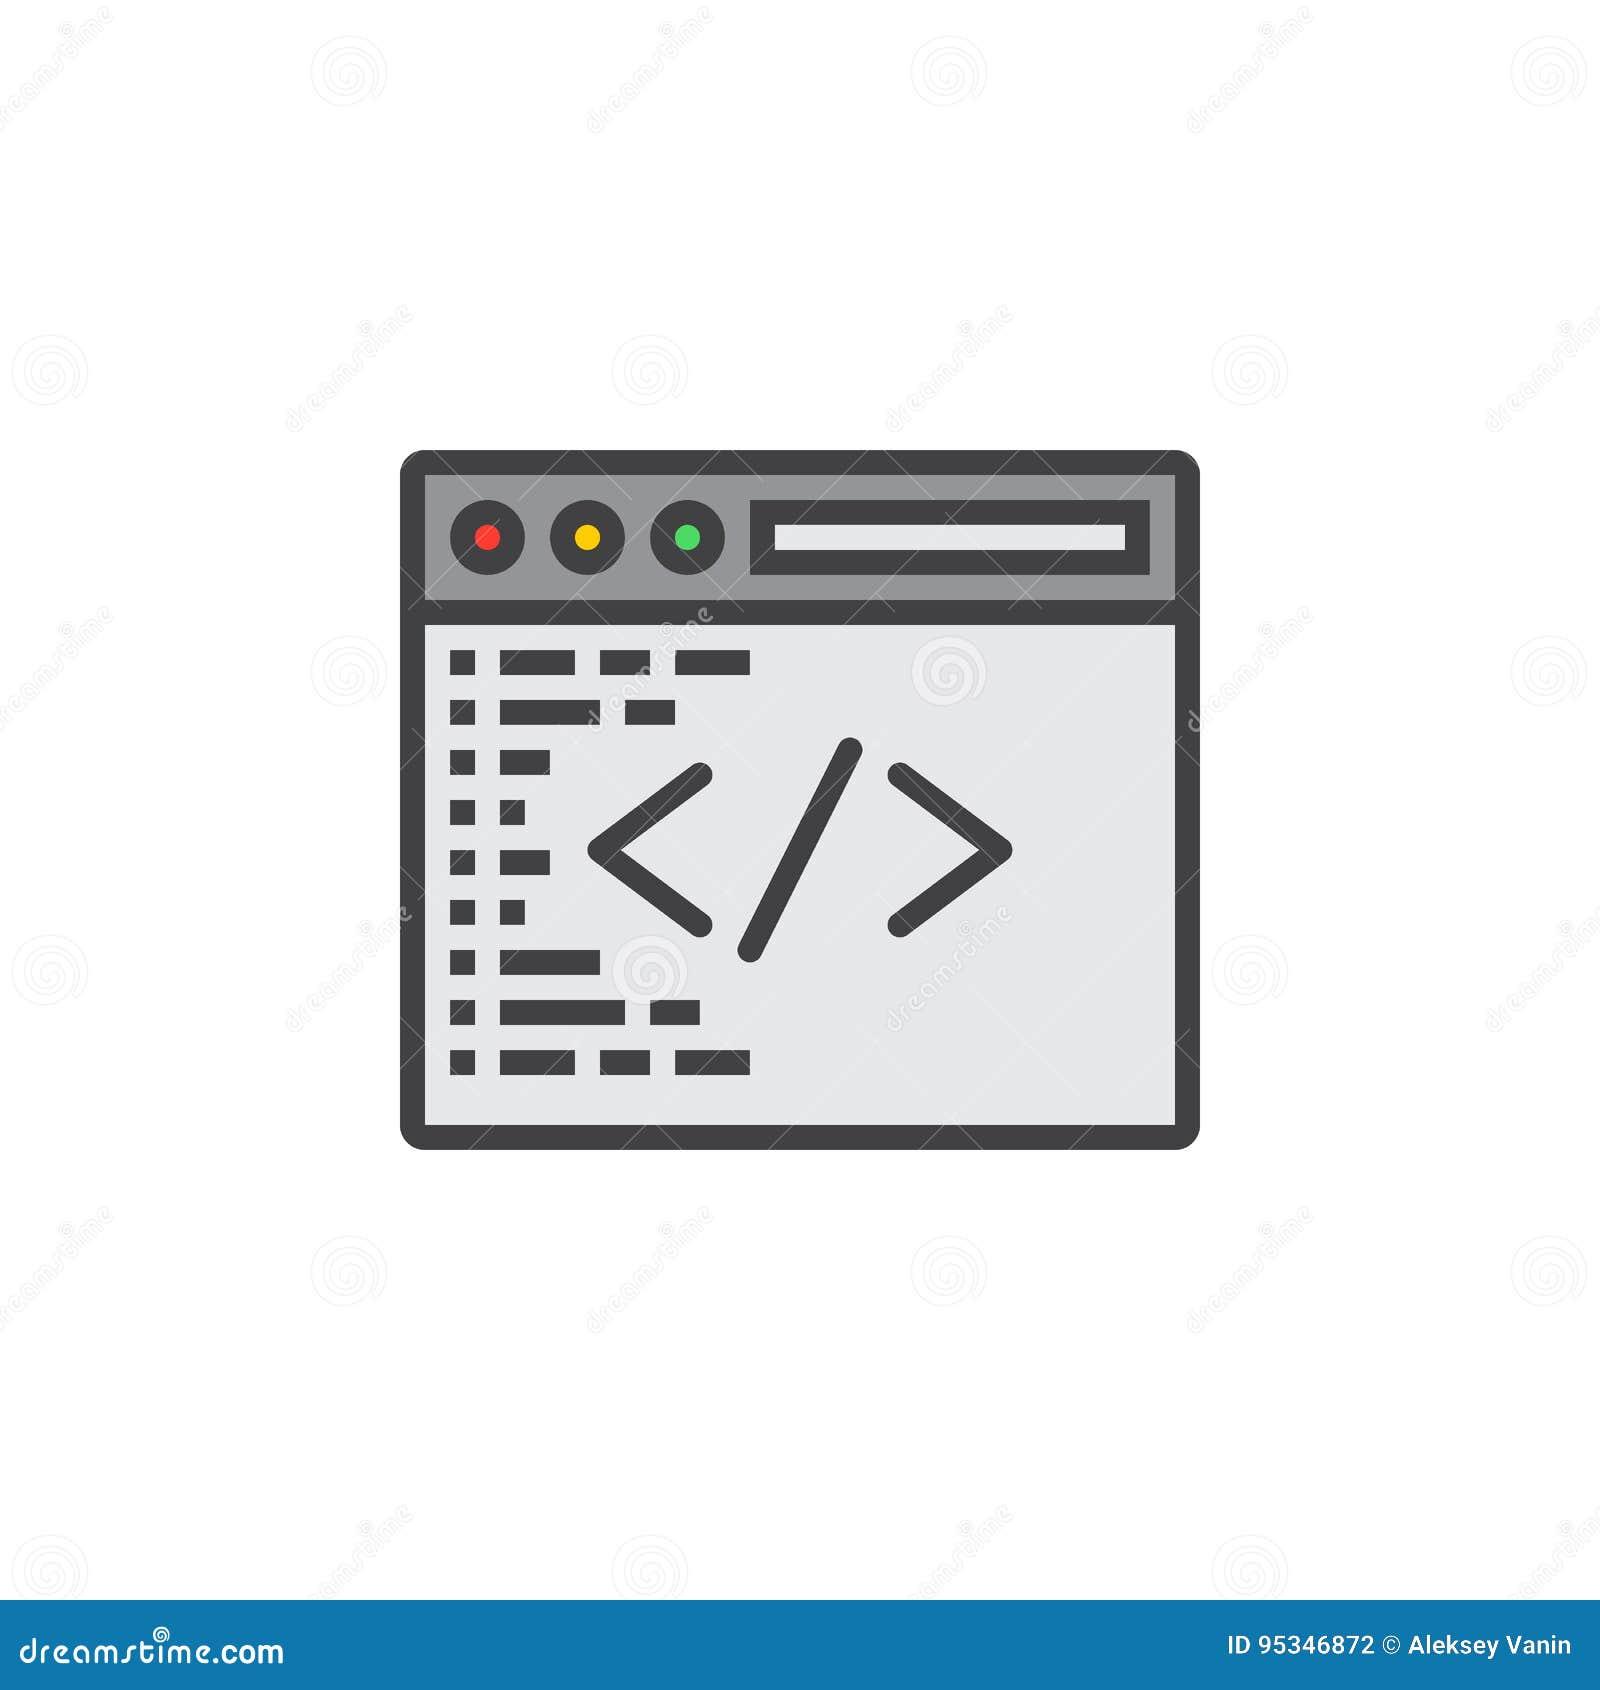 Custom coding symbol. Programming line icon, filled outline